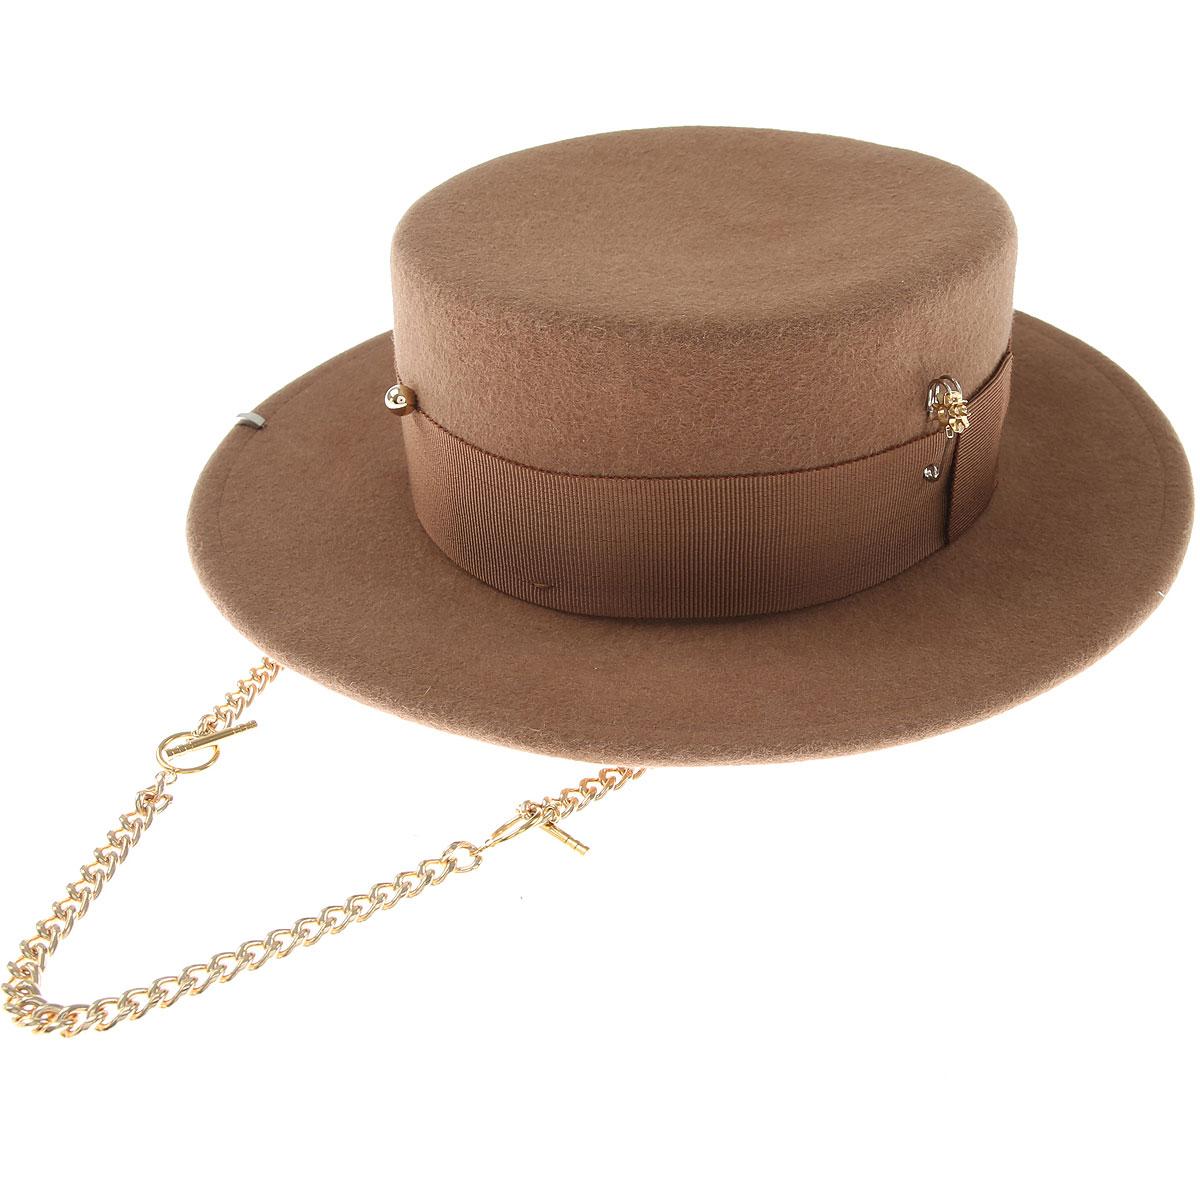 Ruslan Baginskiy Hat for Women On Sale, Camel, Felt, 2019, Small X-Small